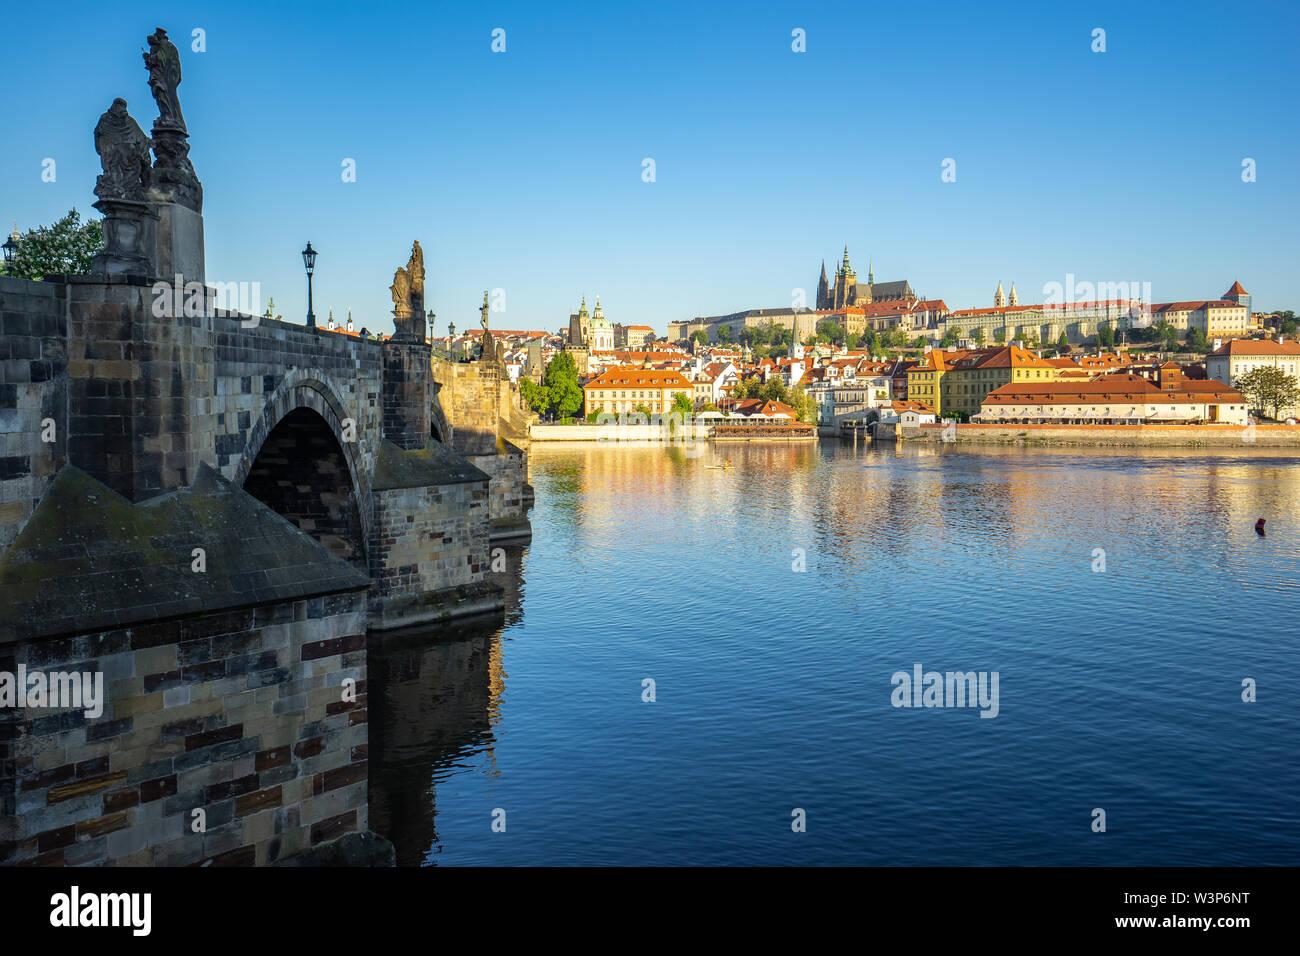 Charles Bridge with Prague city skyline in Prague, Czech Republic. - Stock Image